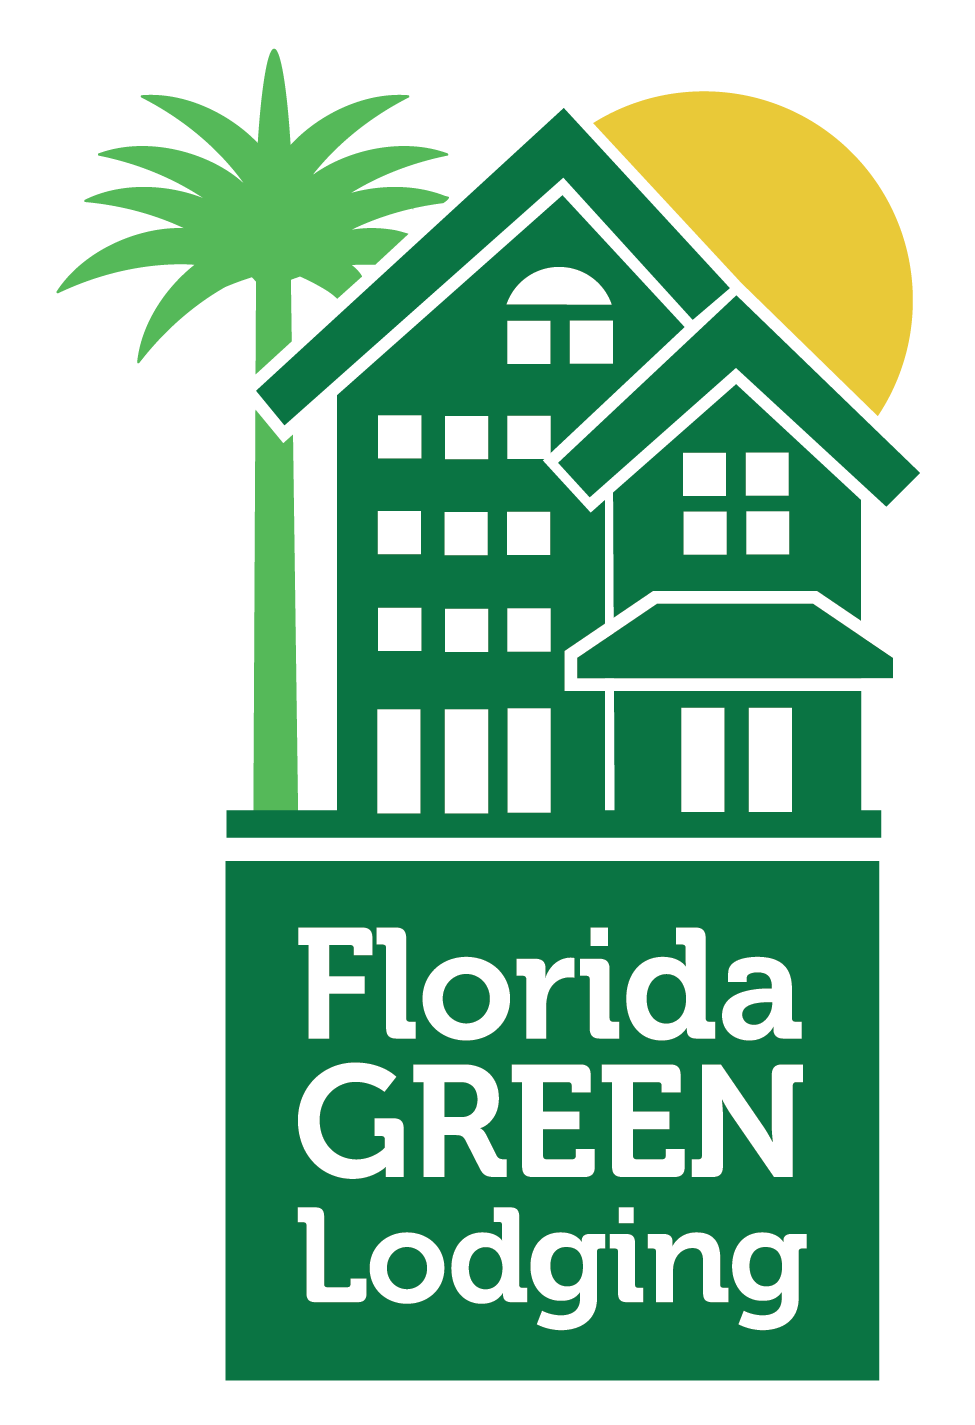 Florida Green Lodging graphic